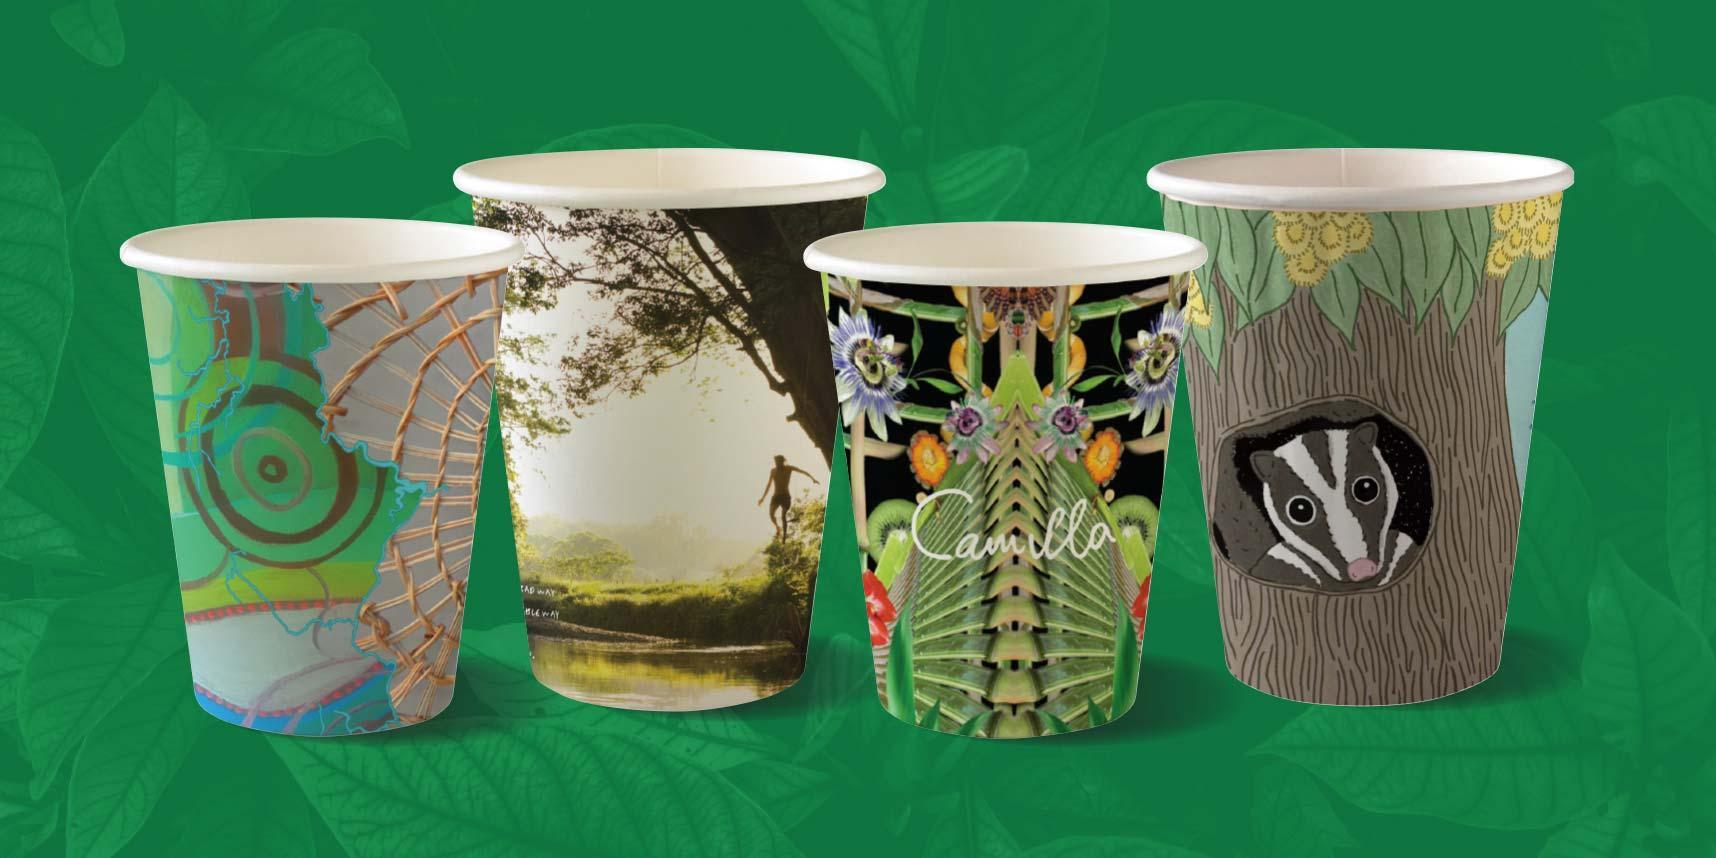 Rainforest rescue cups